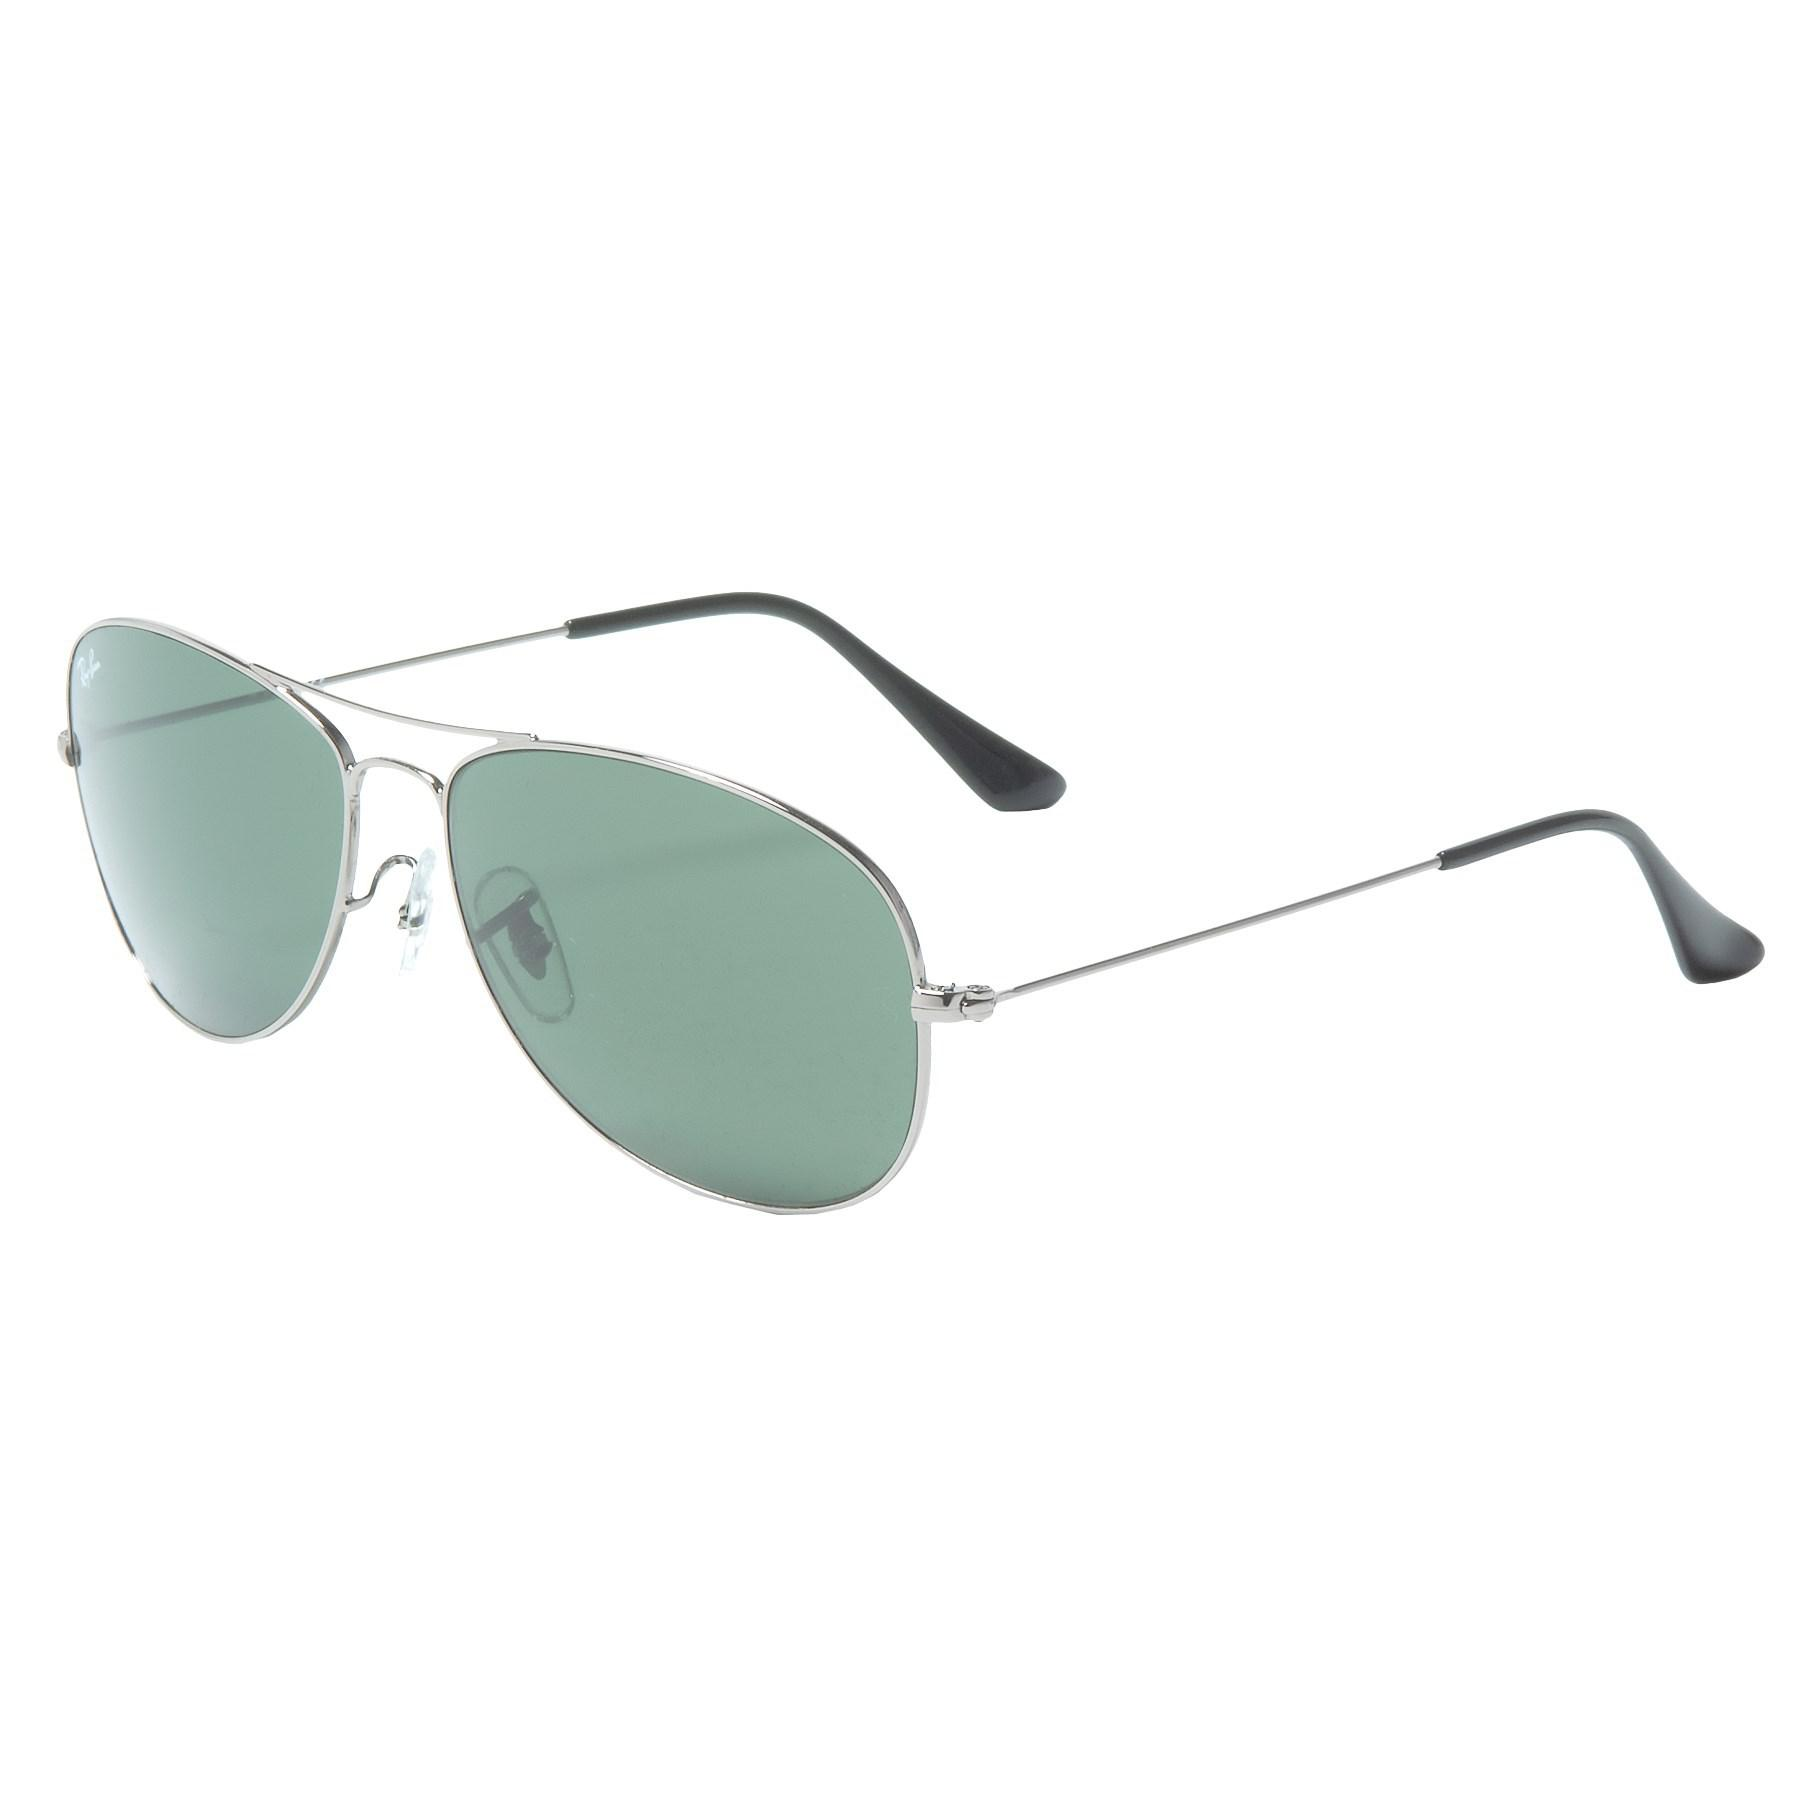 cc1e9d3f398d1d Lyst - Ray-Ban Cockpit Aviator Classic Sunglasses in Green for Men